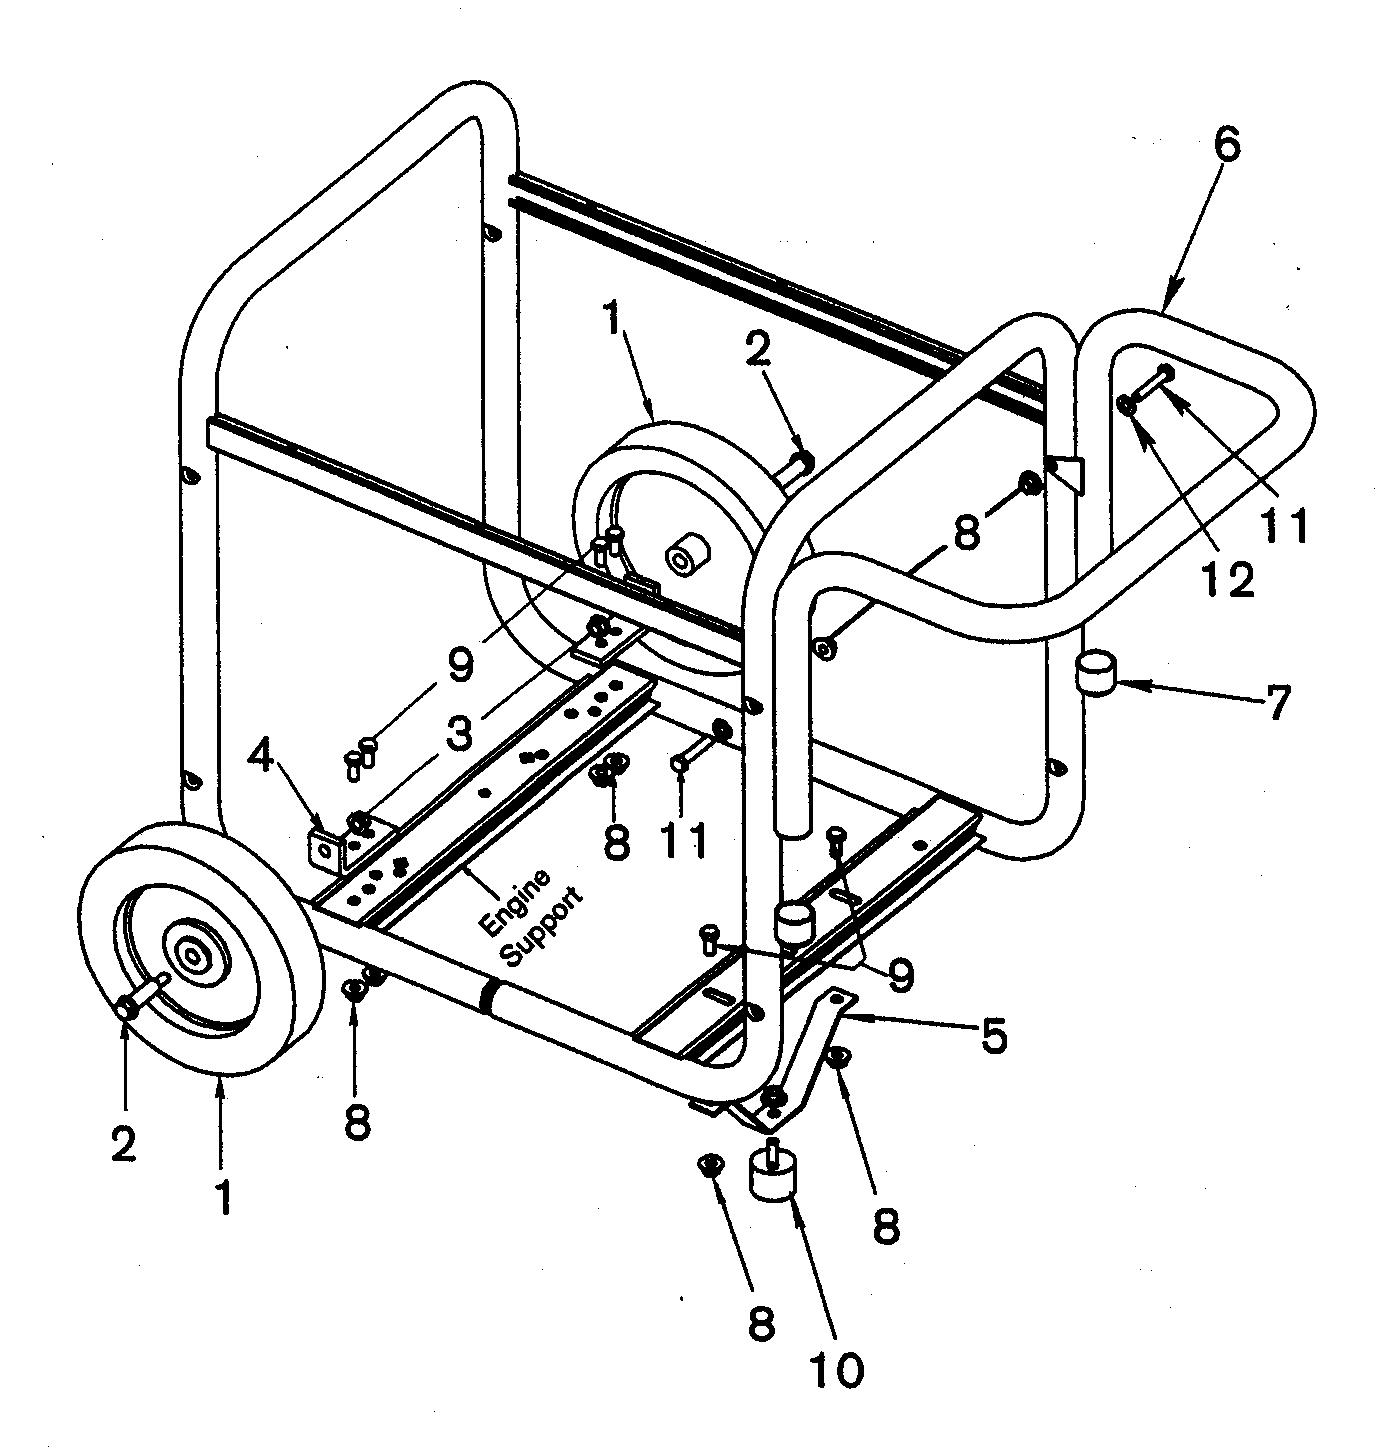 Craftsman model 919670040 generator genuine parts